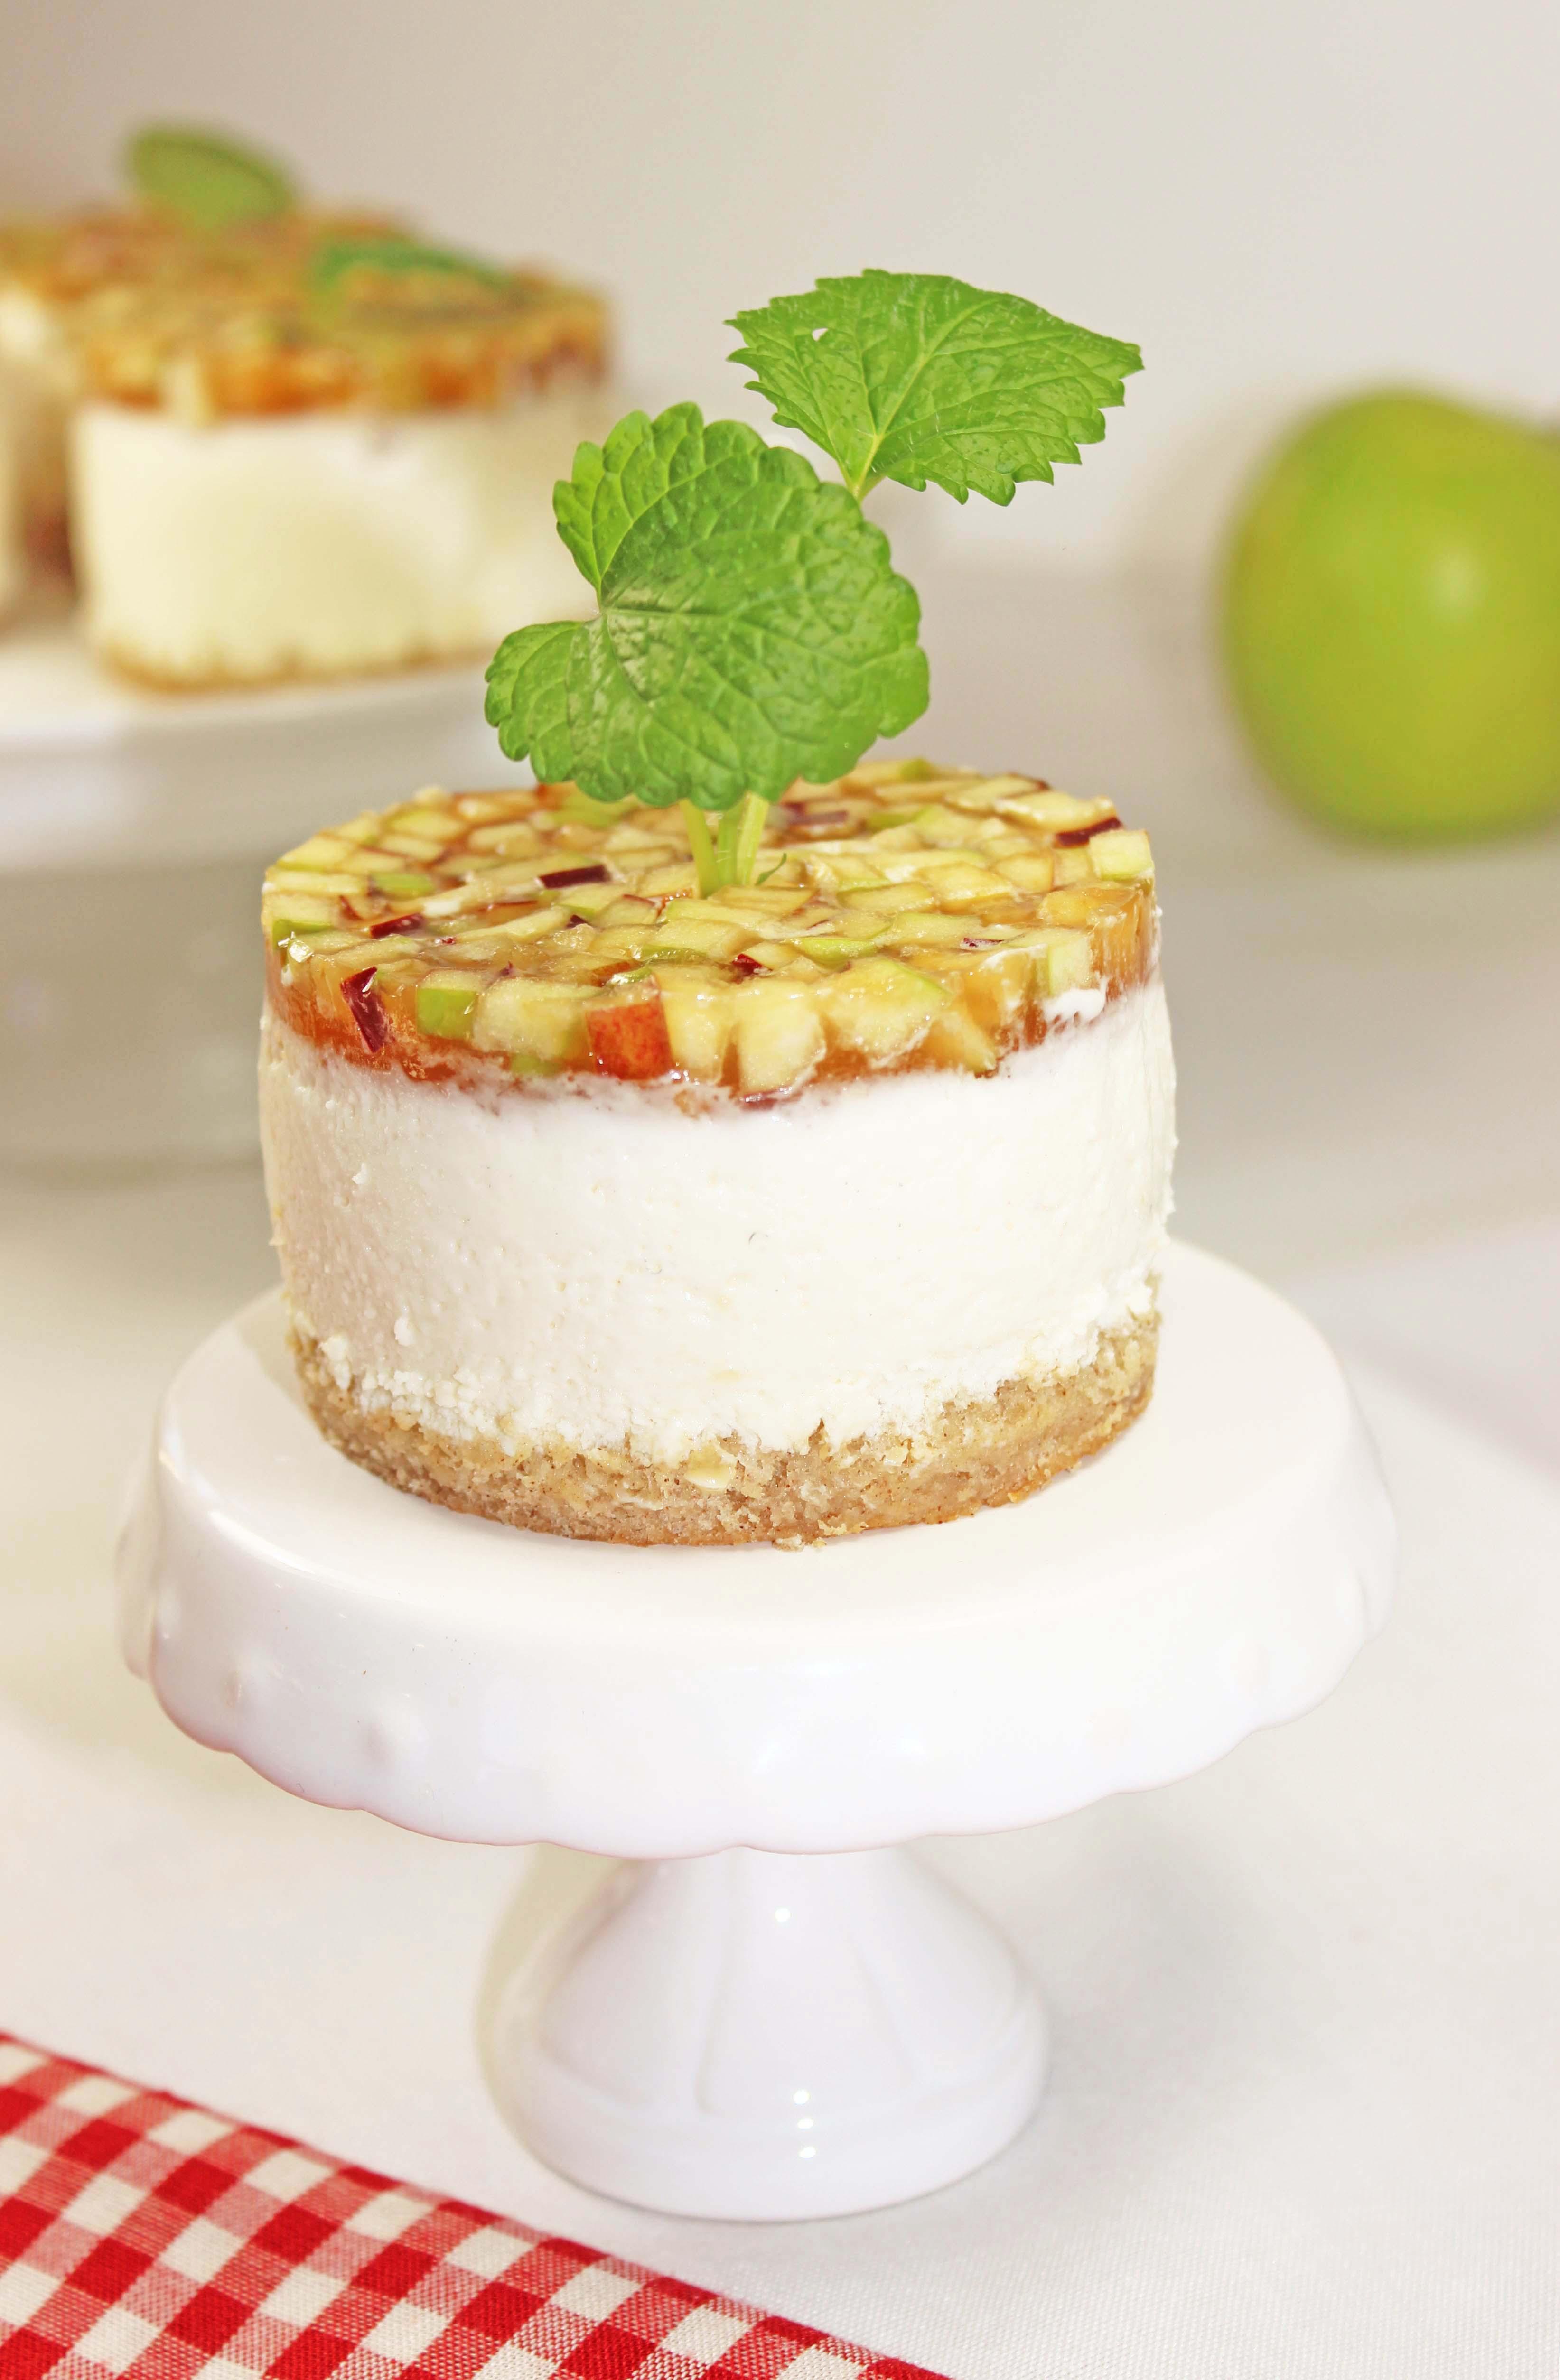 Apfel-Quark Törtchen